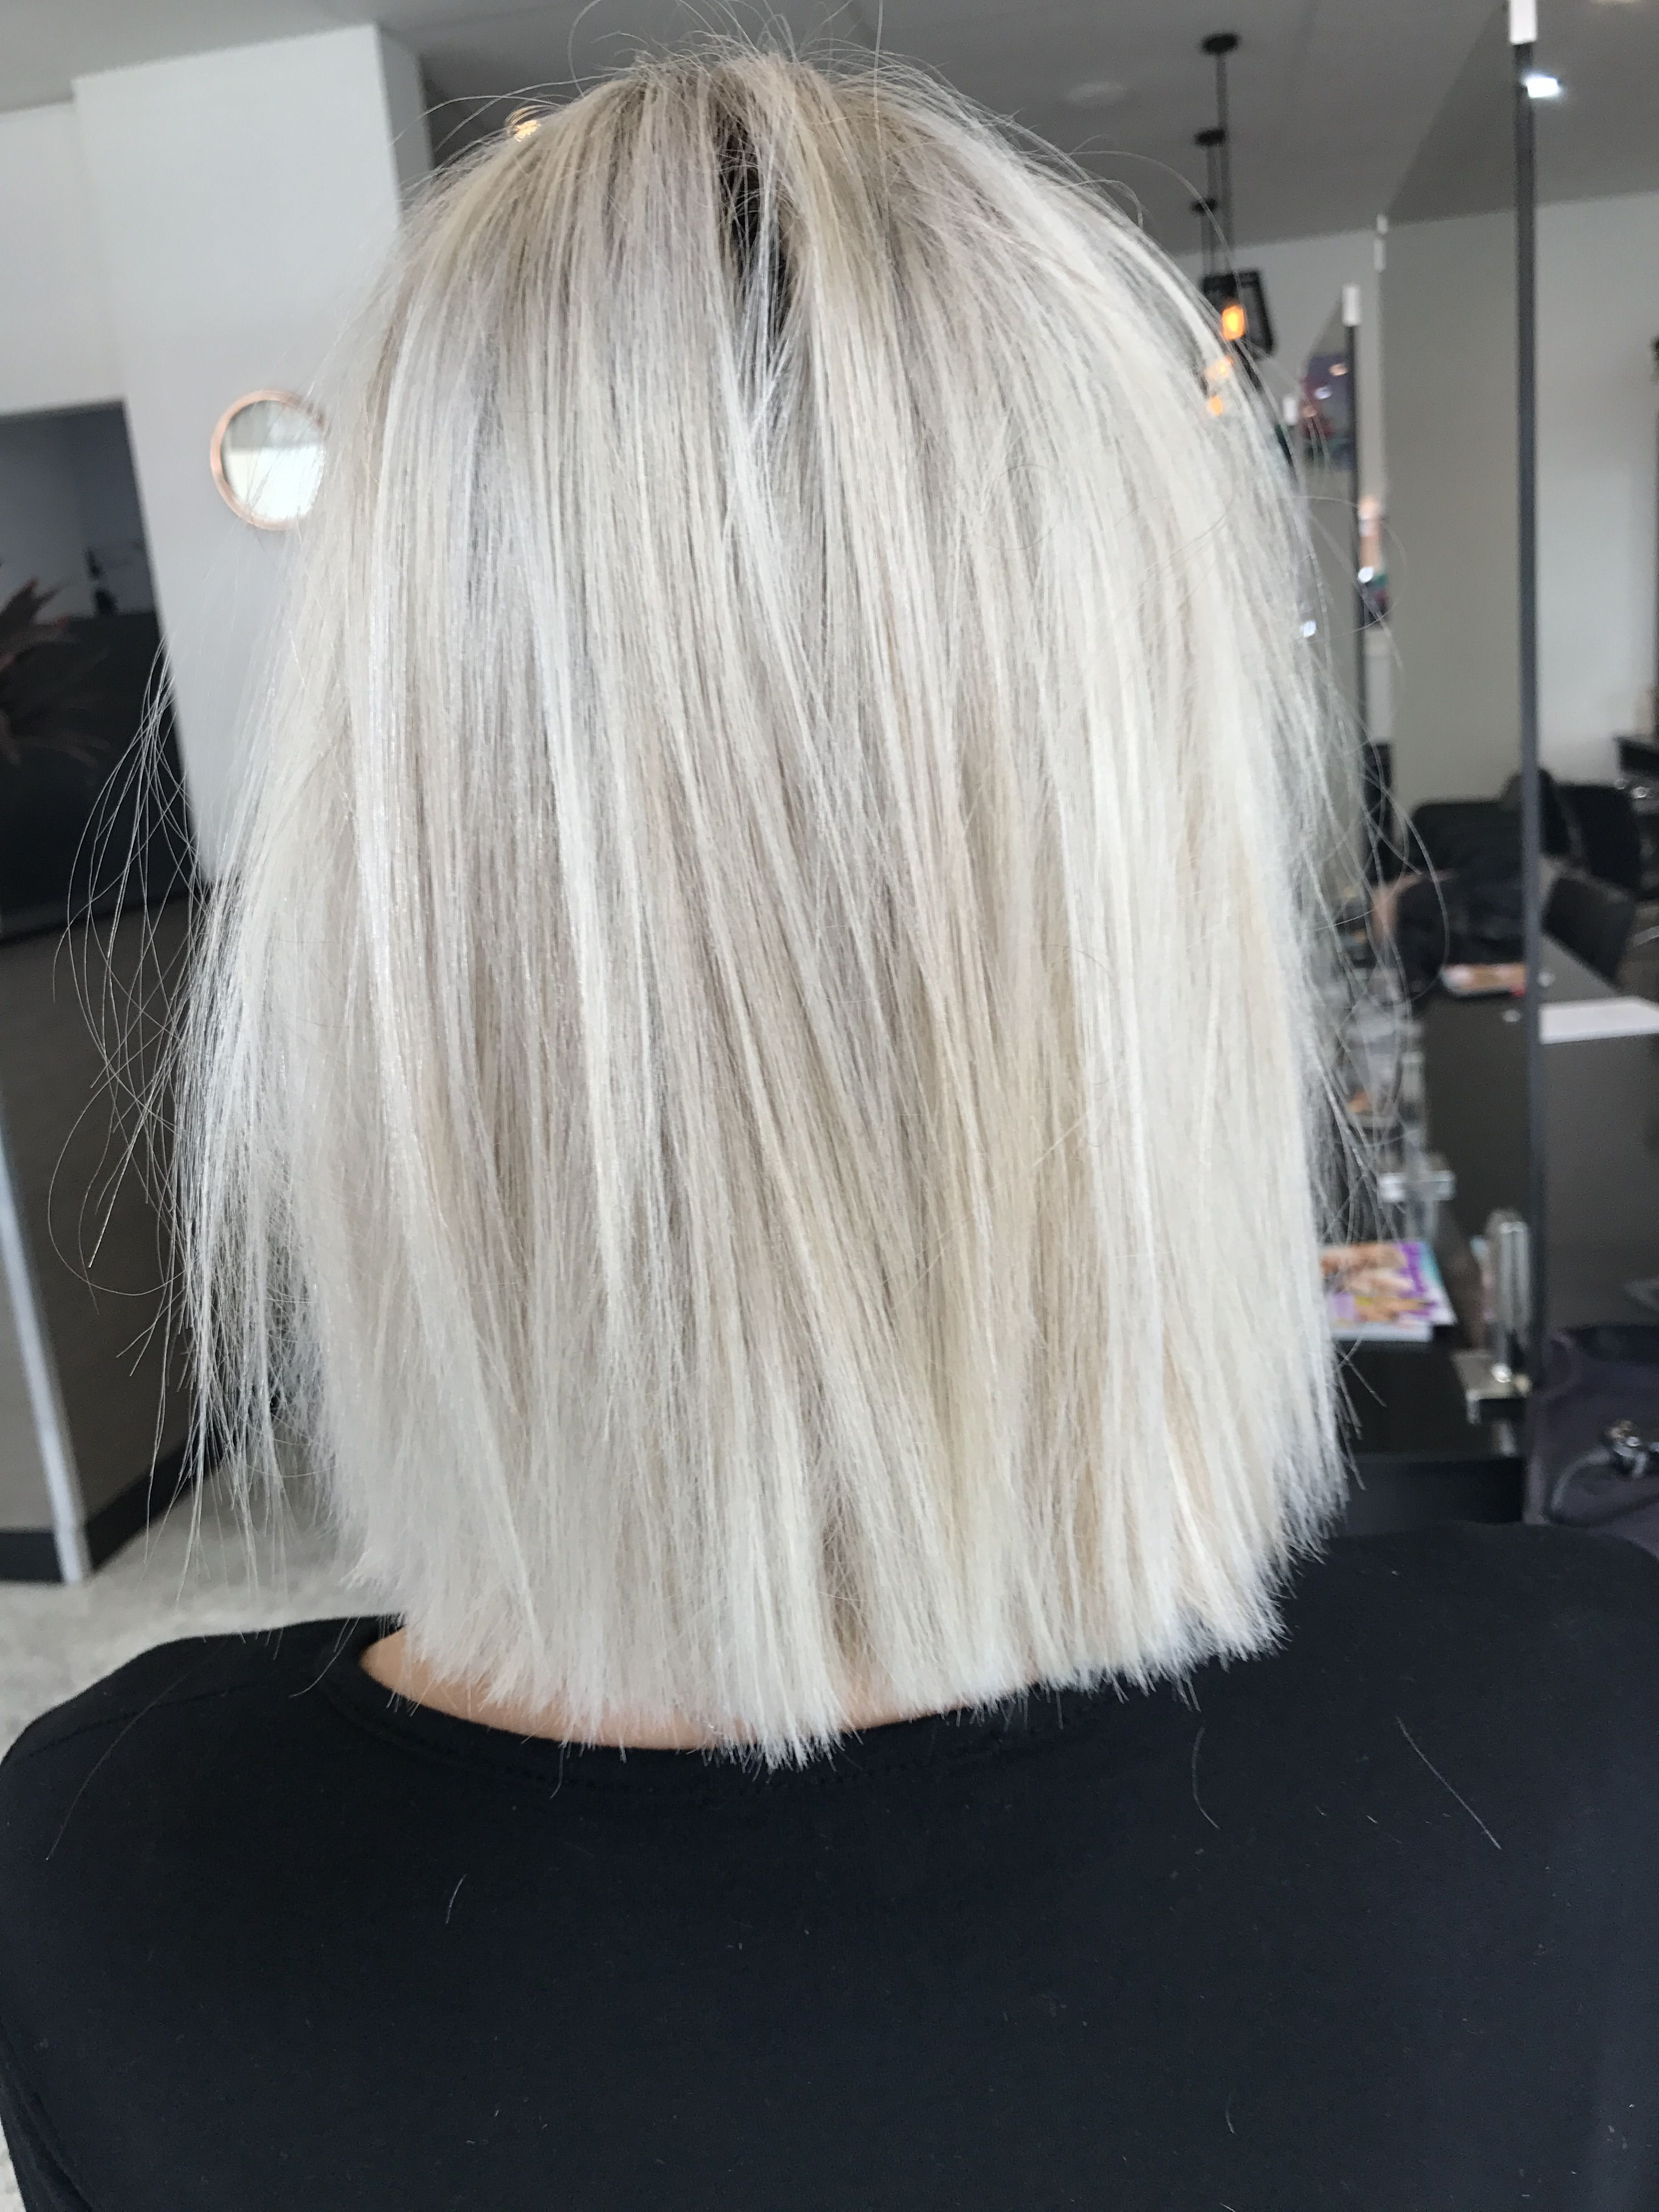 blonde hair short lob textured